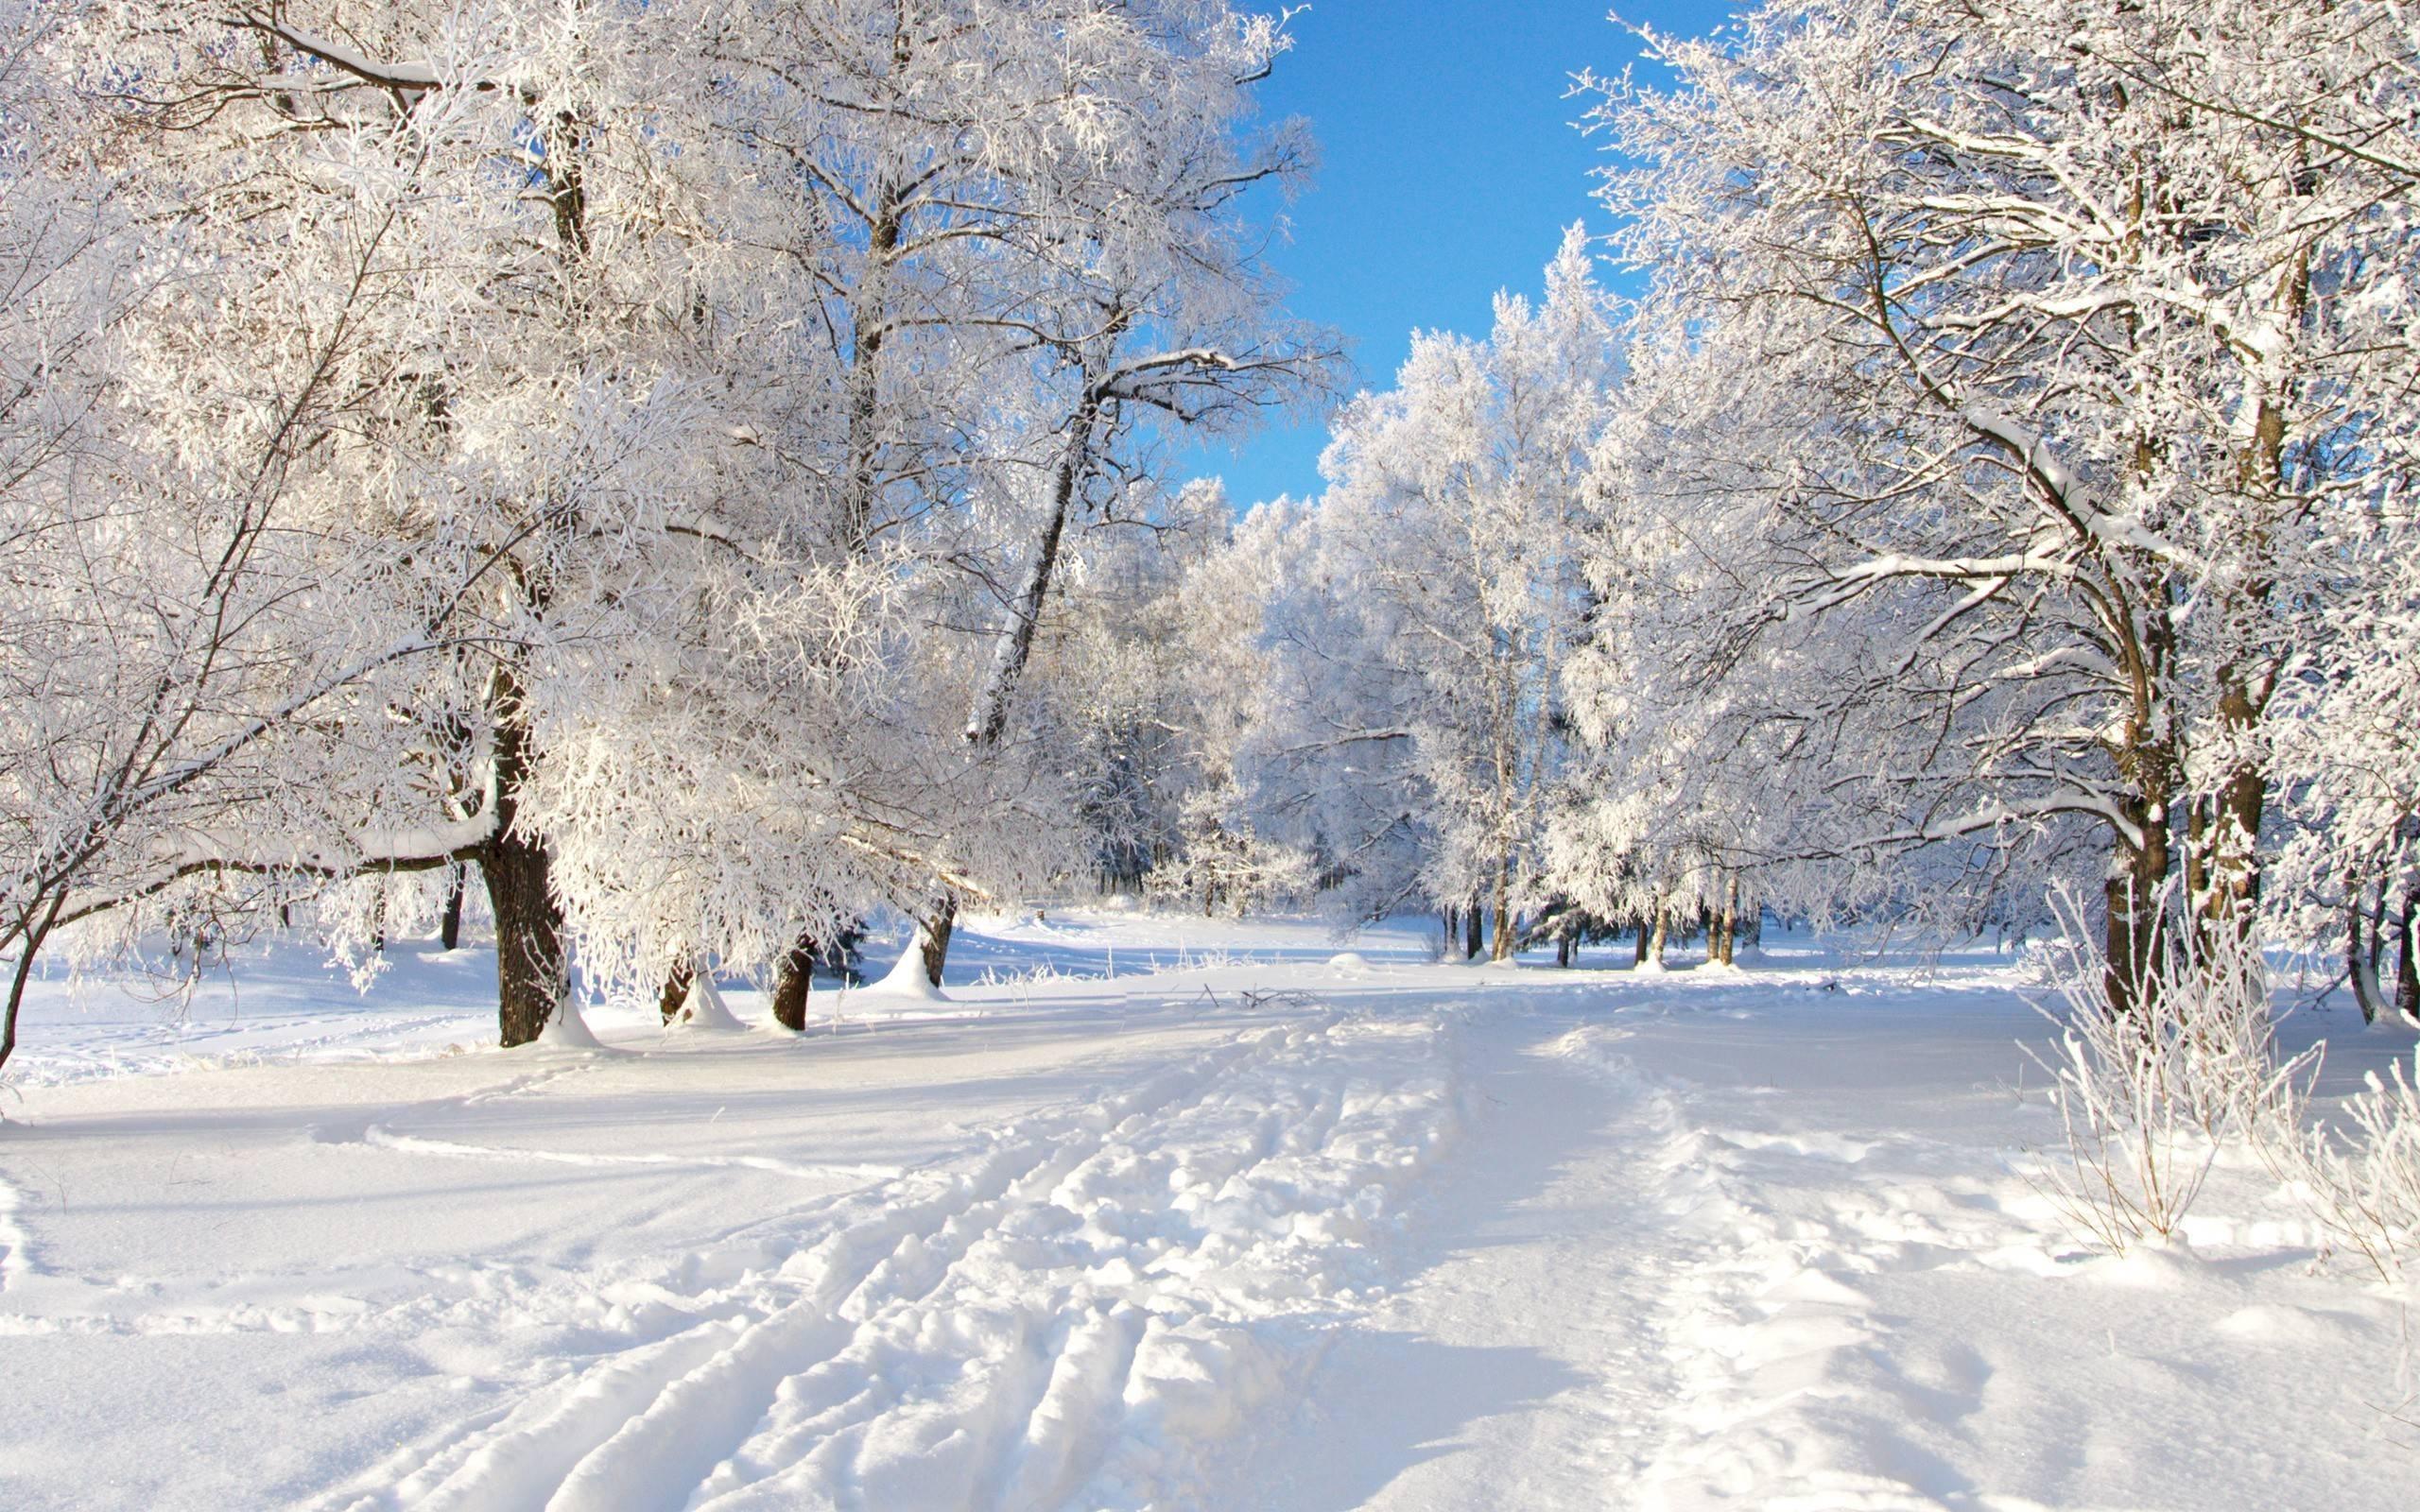 snow wallpapers 01501 - baltana